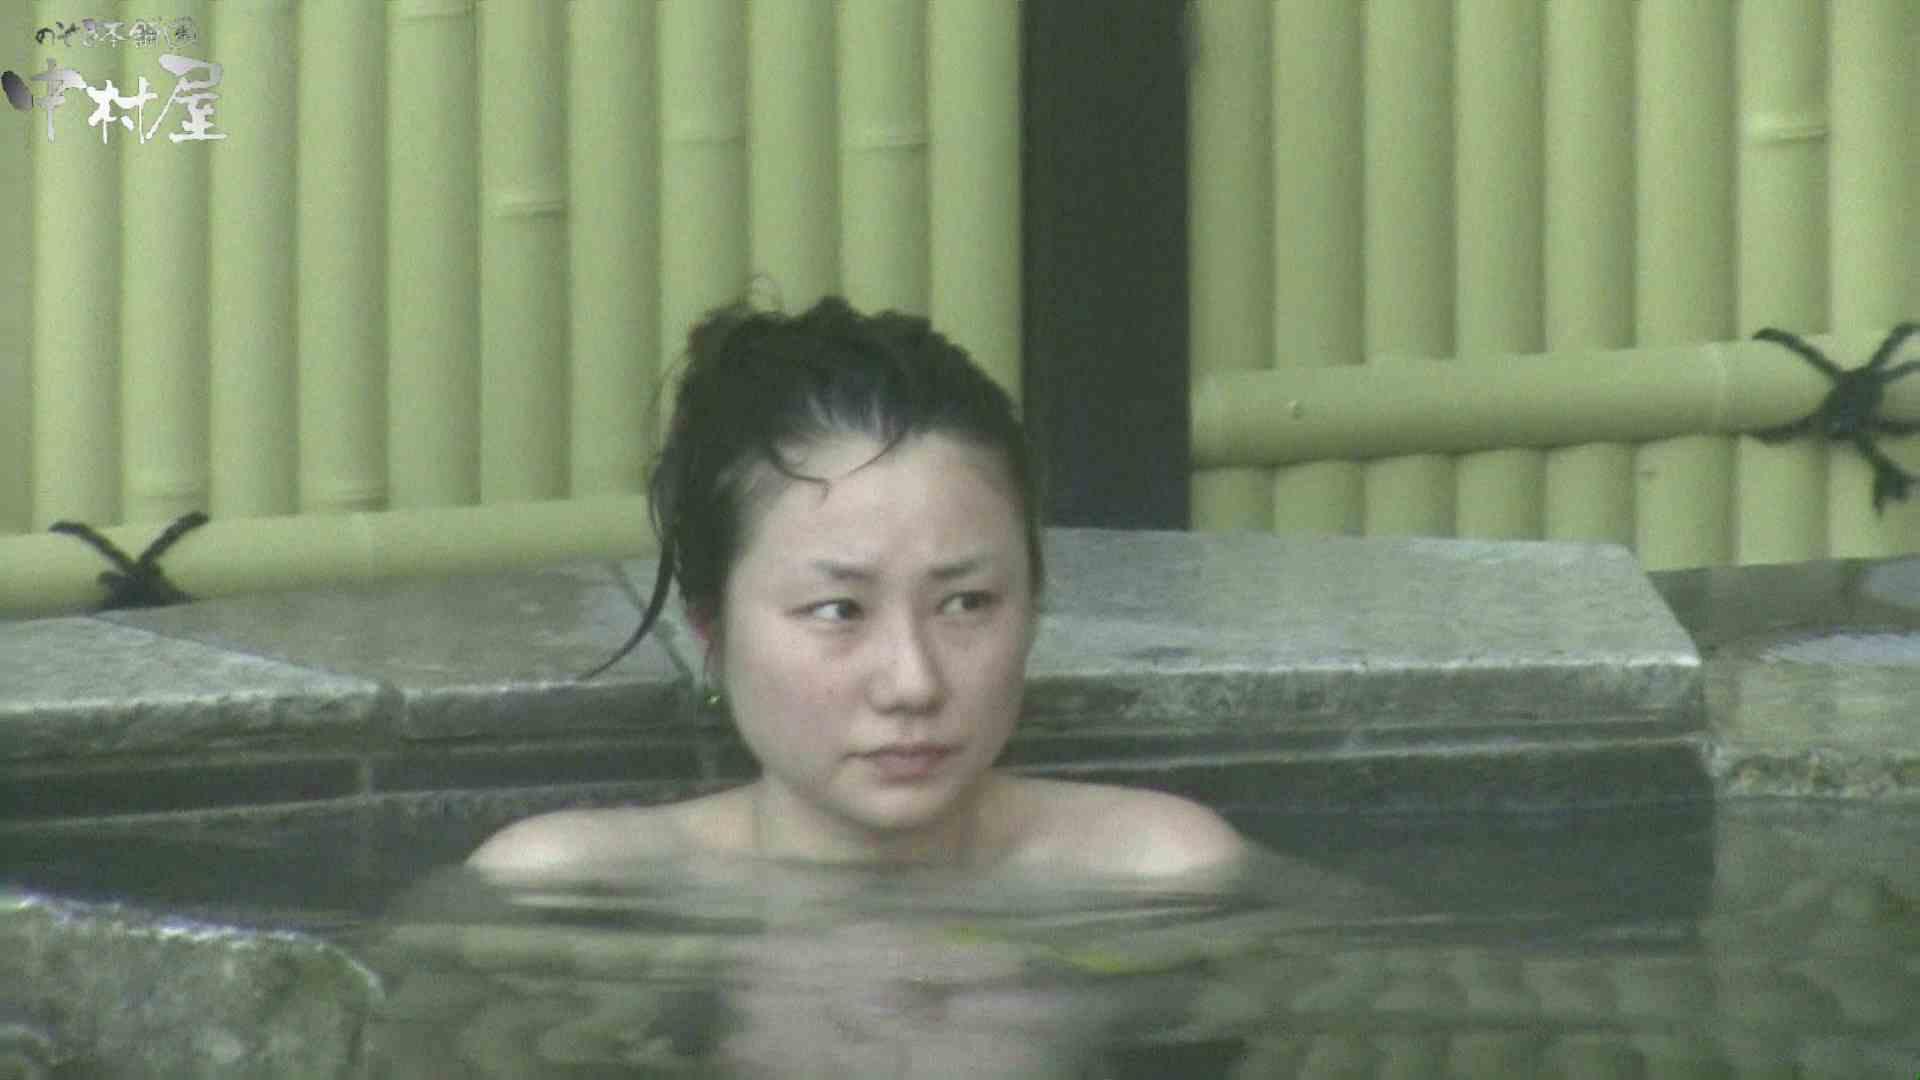 Aquaな露天風呂Vol.969 露天風呂編  113PIX 10